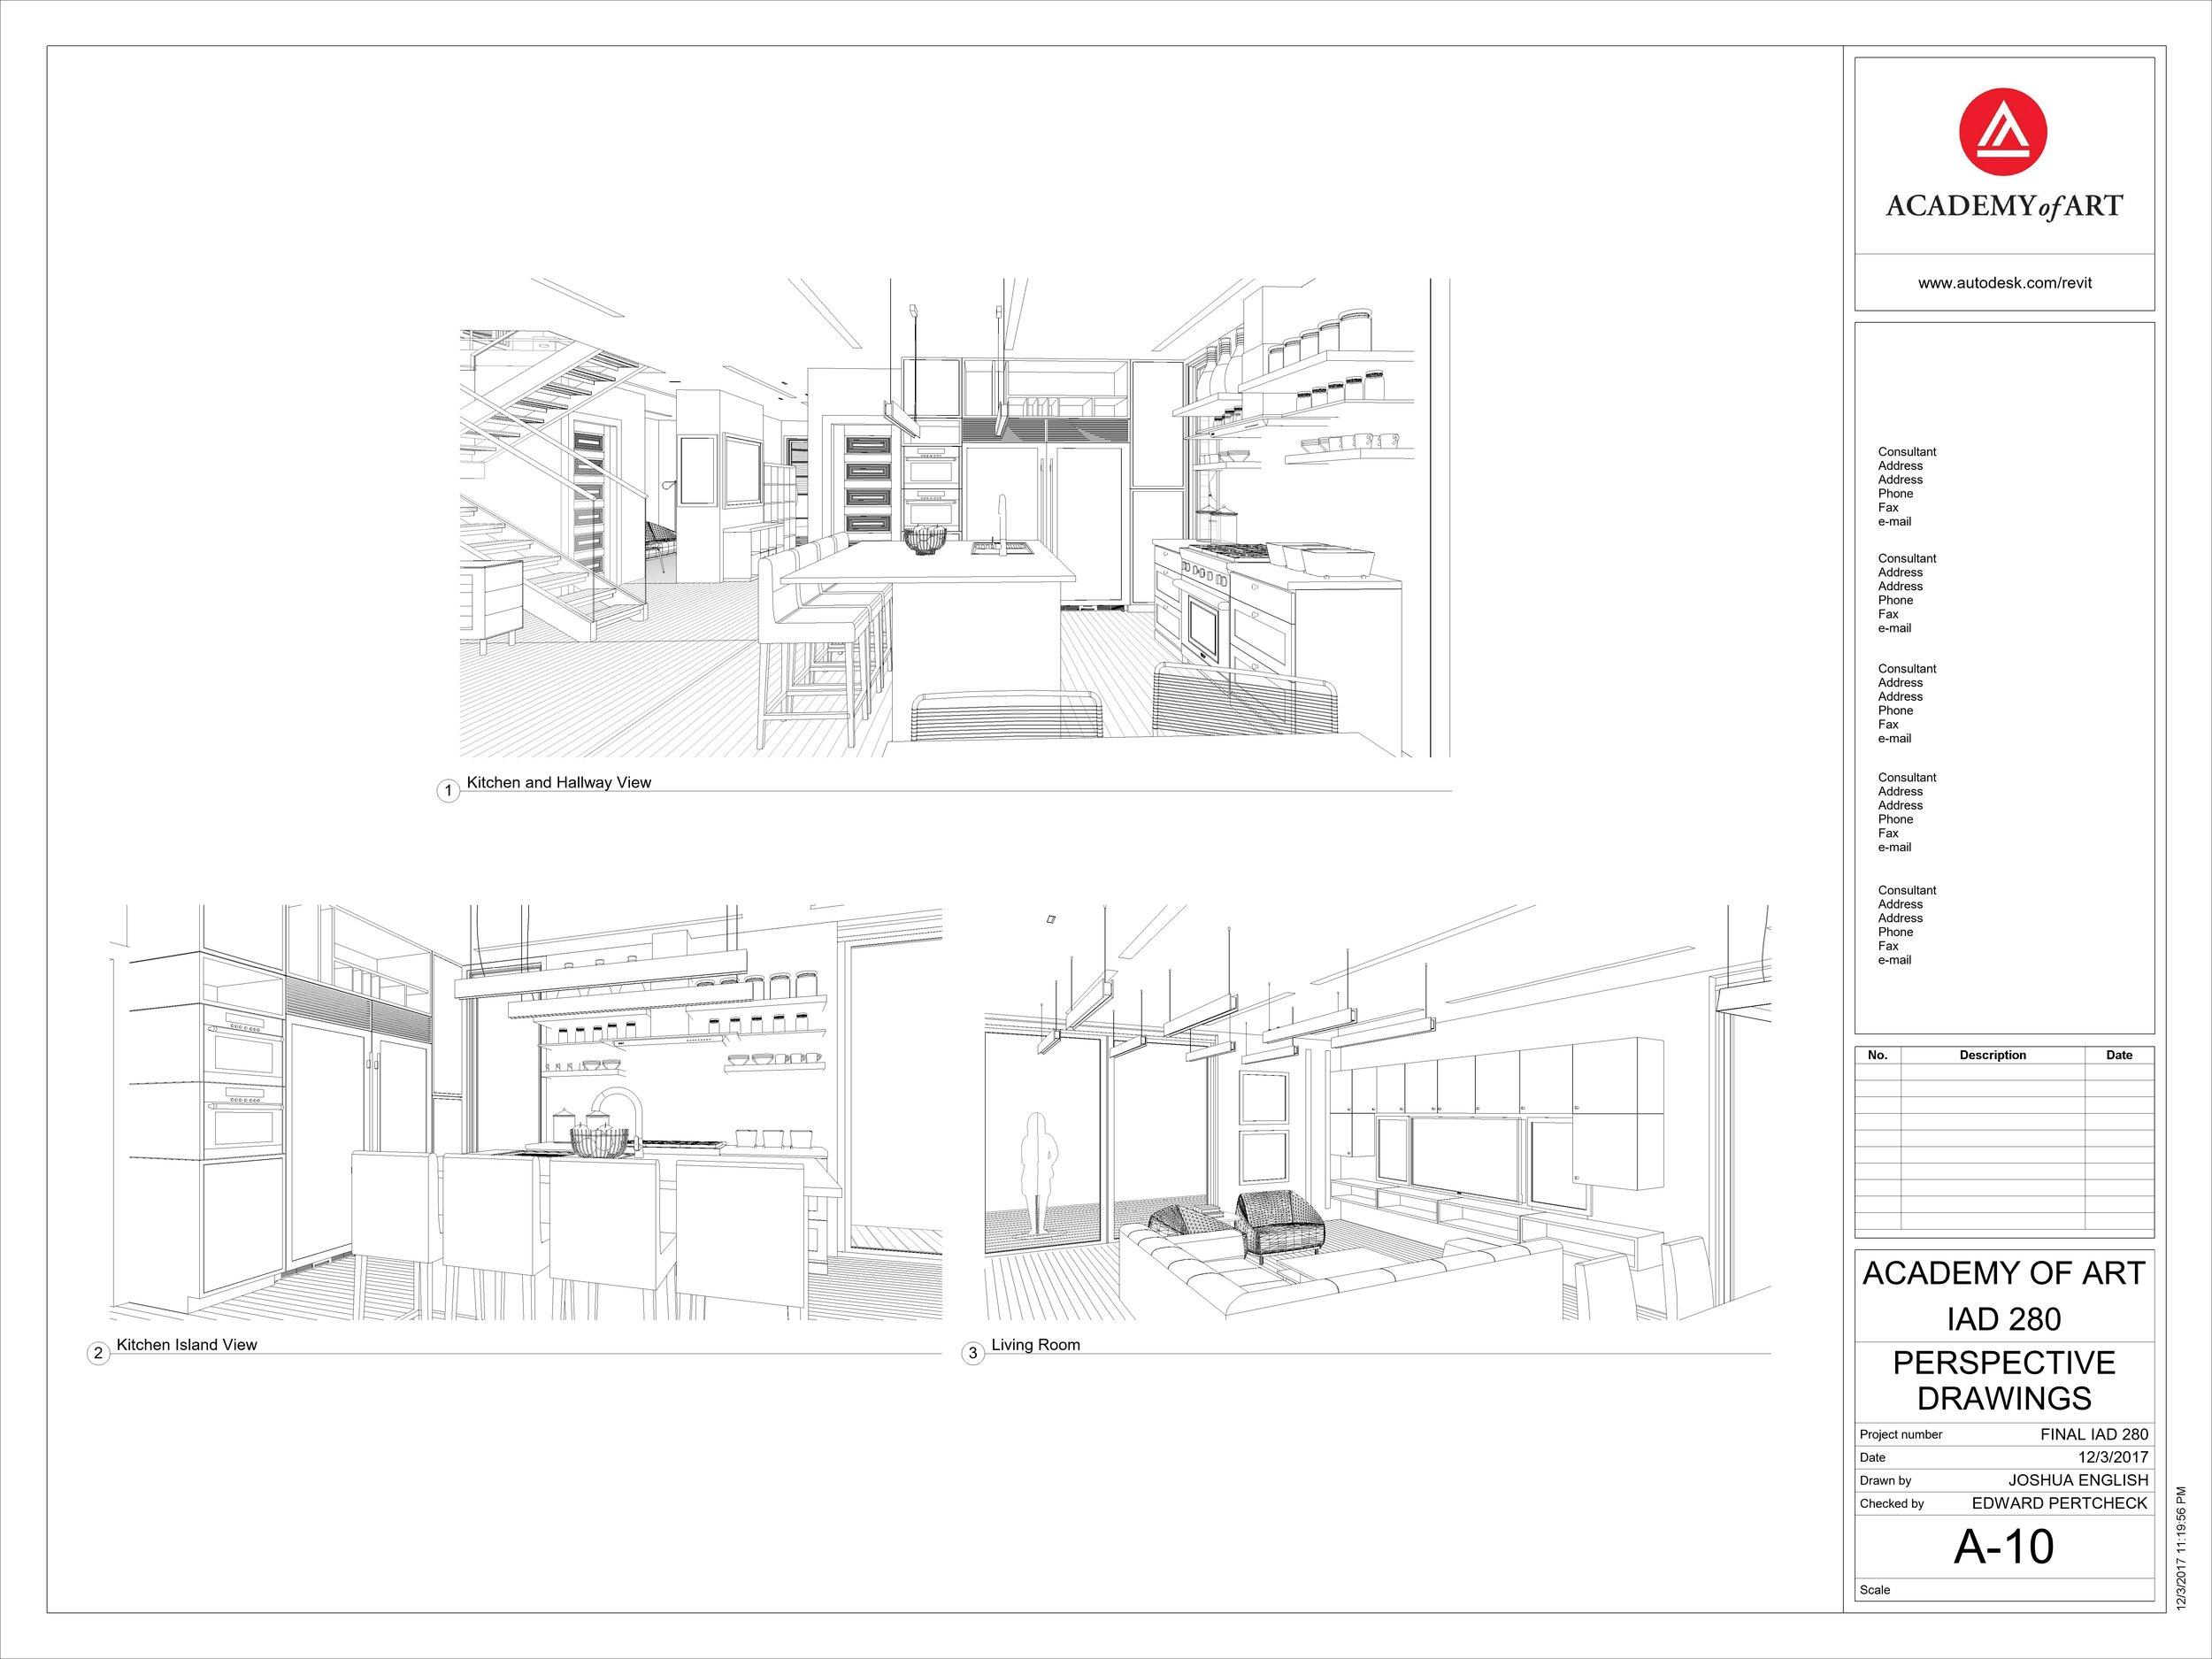 PP12 - Sheet - A-10 - PERSPECTIVE DRAWINGS.jpg